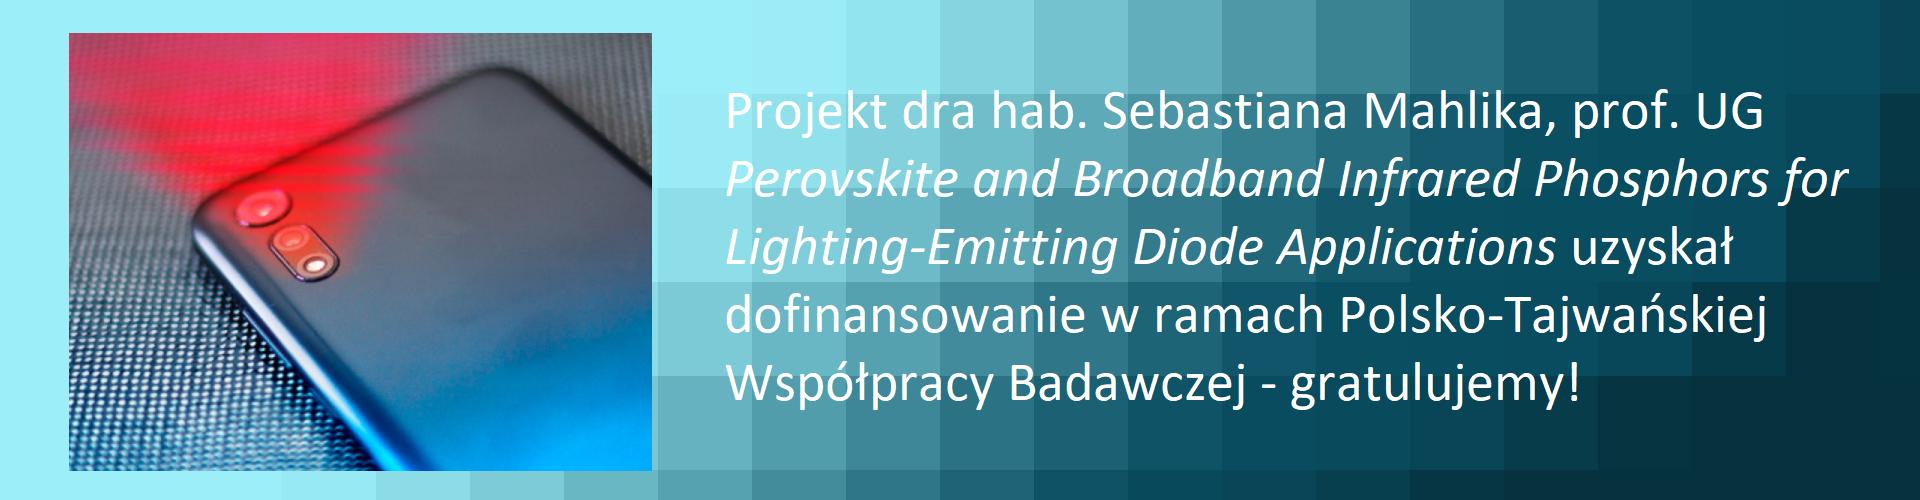 Dofinansowanie grantu dra hab. S. Mahlika, prof. UG